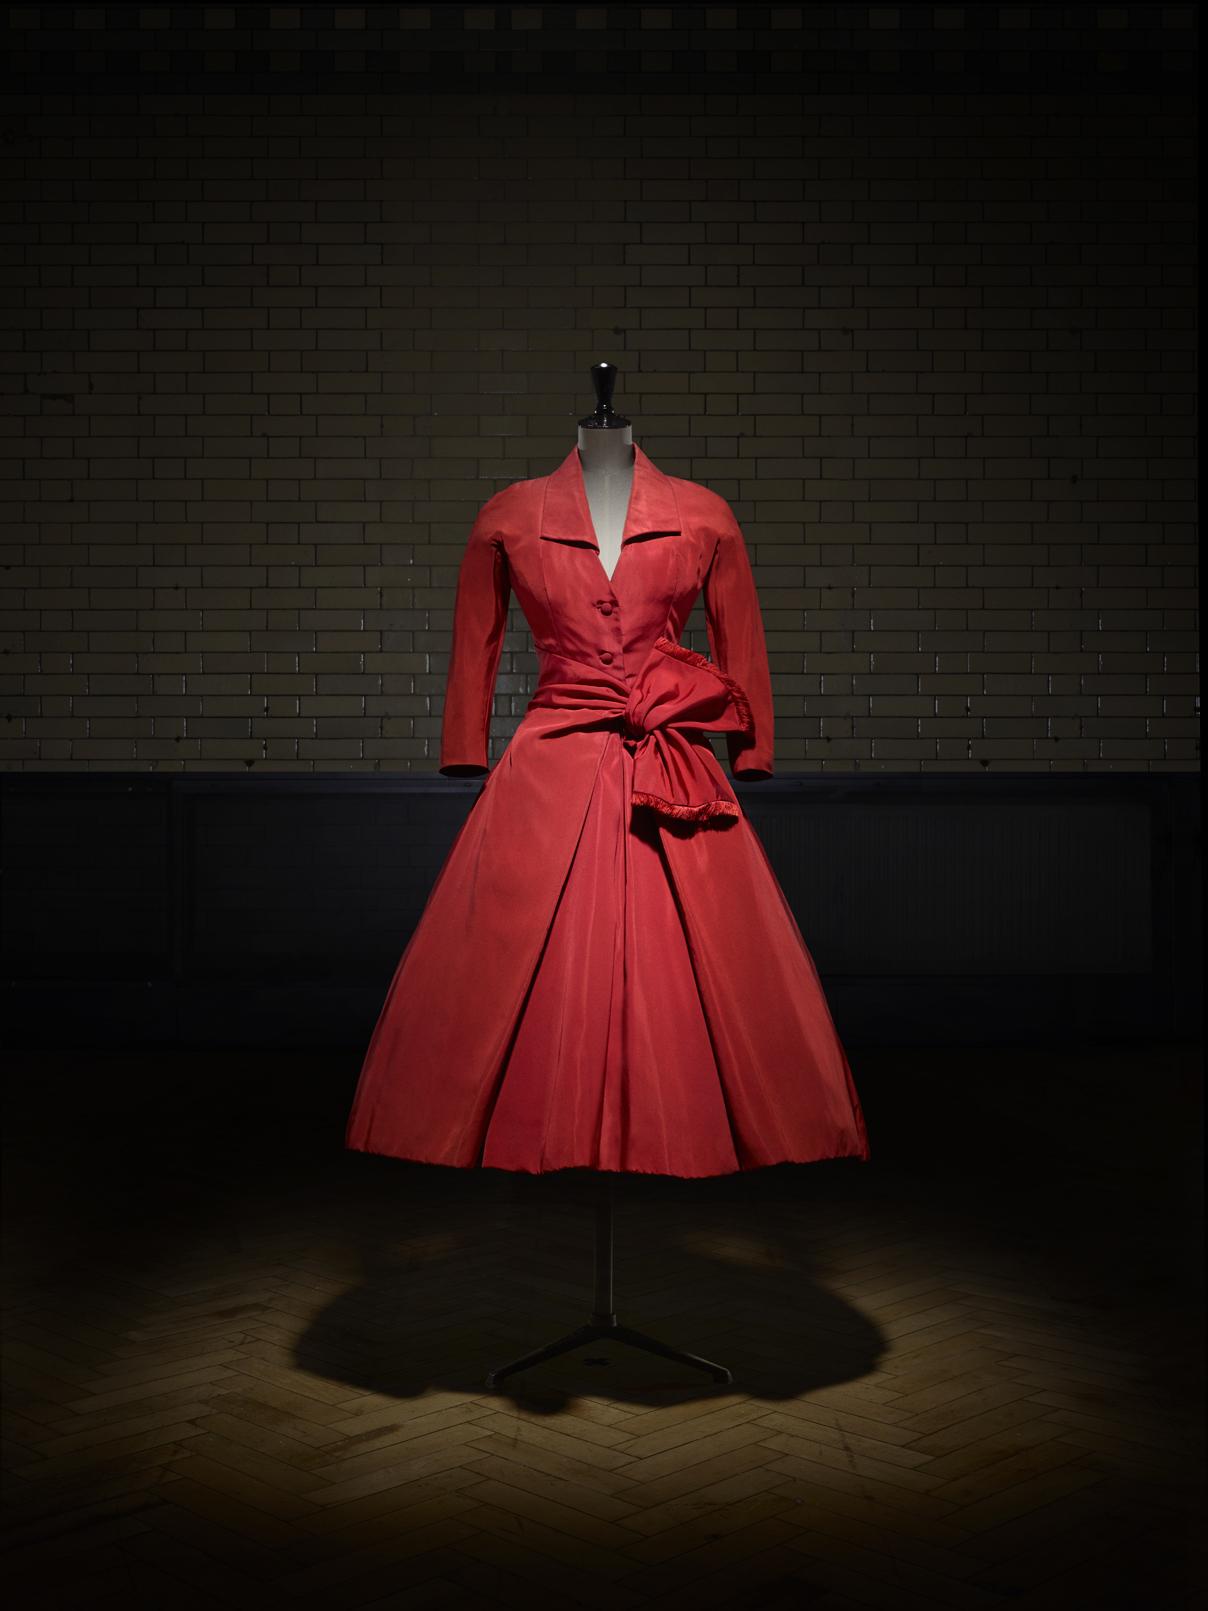 «Écarlate»: Απογευματινό φόρεμα από την κολεξιόν υψηλής ραπτικής Φθινόπωρο/Χειμώνας, 1955